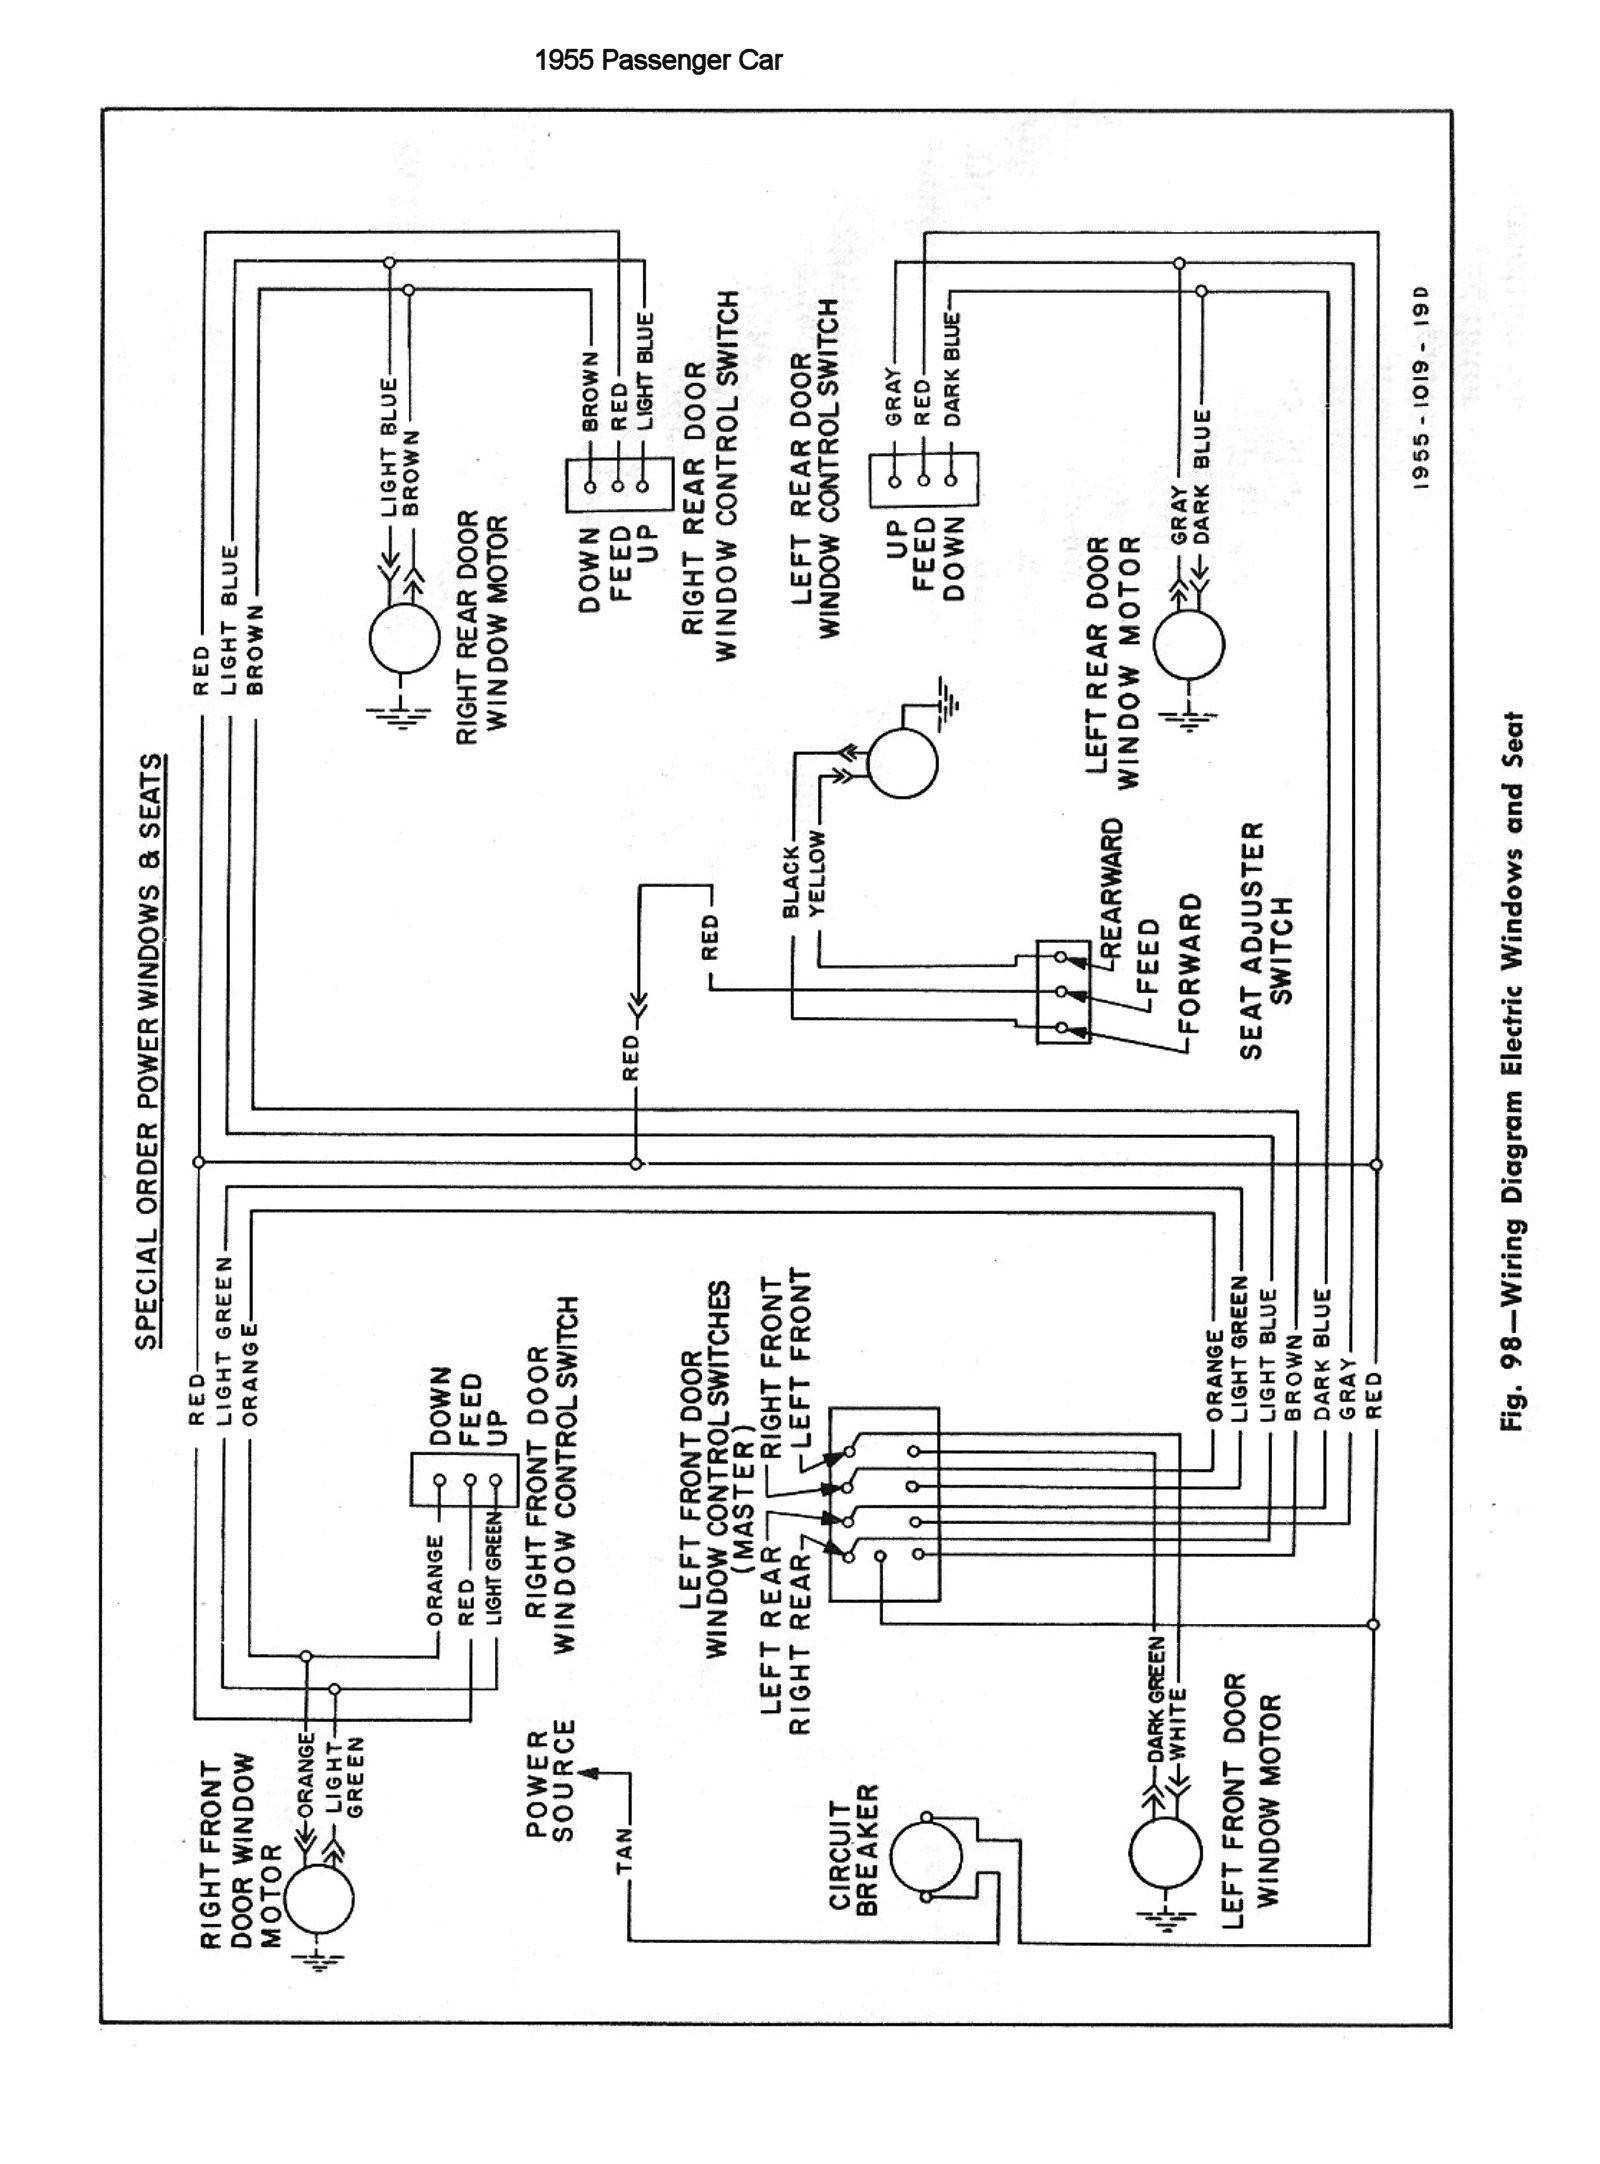 1985 Chevy Truck Wiring Diagram Chevy Wiring Diagrams Of 1985 Chevy Truck Wiring Diagram